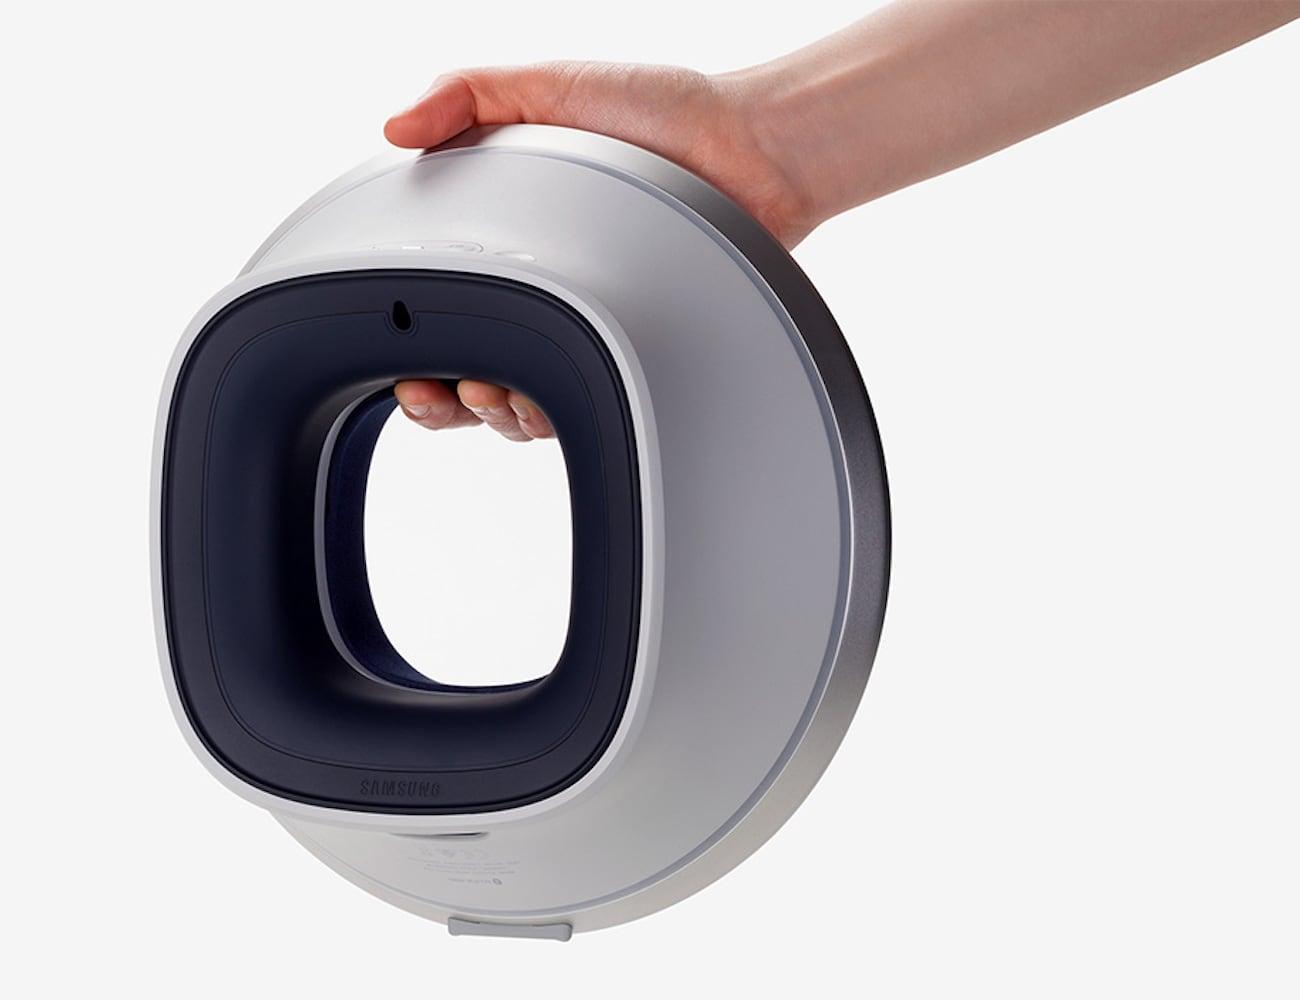 Yanko Eclipse Zero Sound Smart Speaker